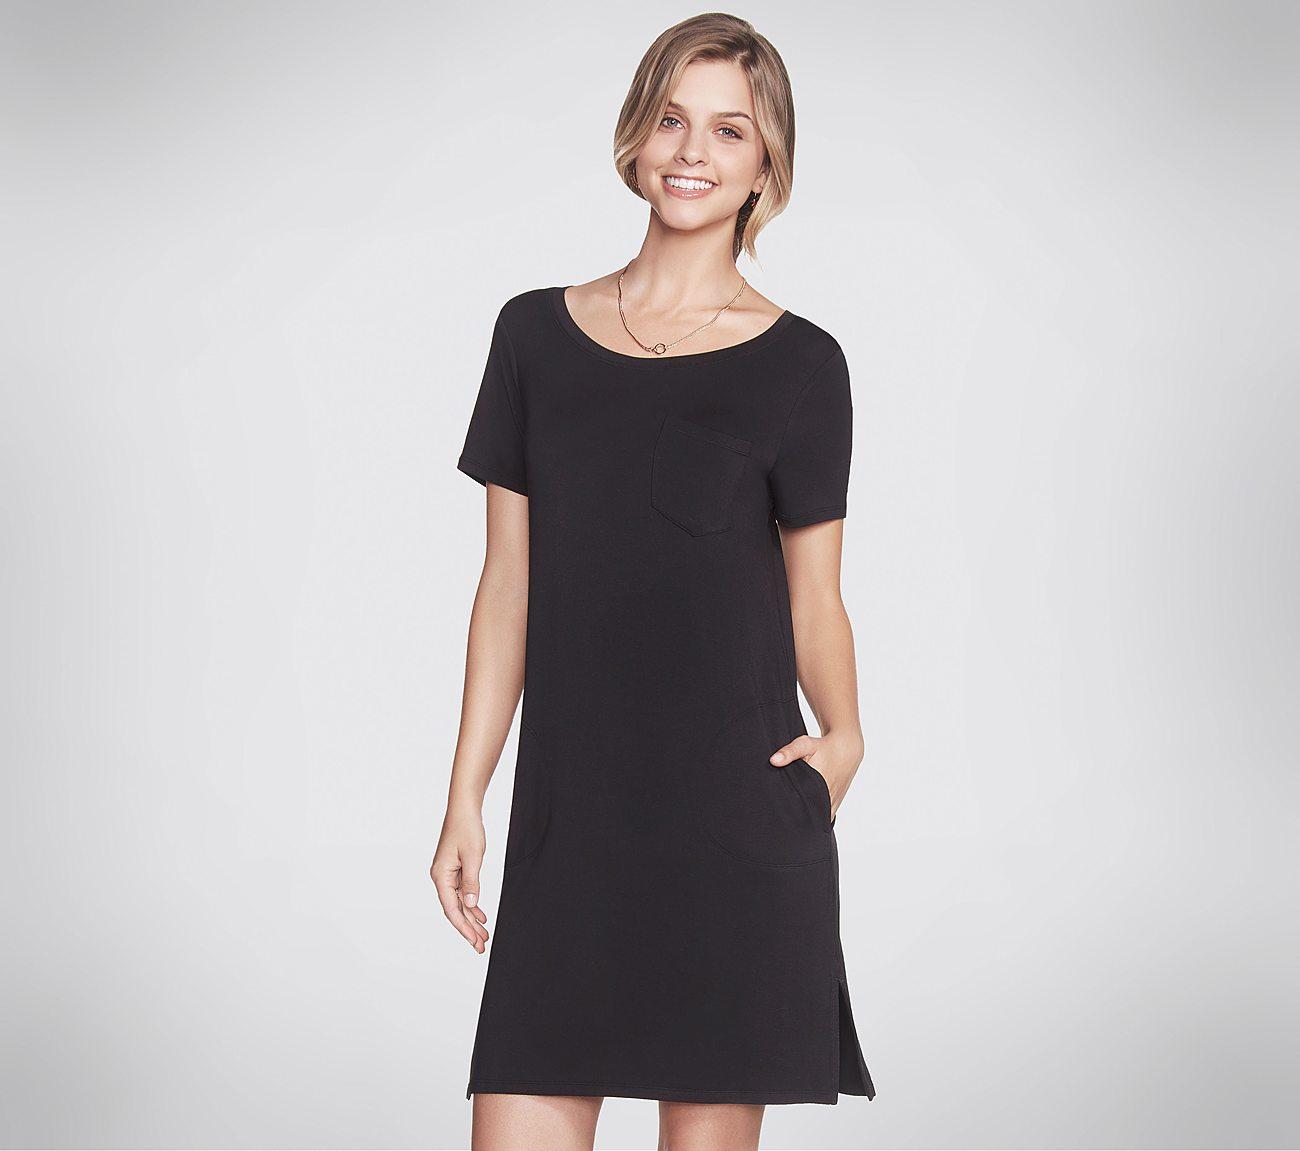 Skechers Apparel Renewal T-Shirt Dress